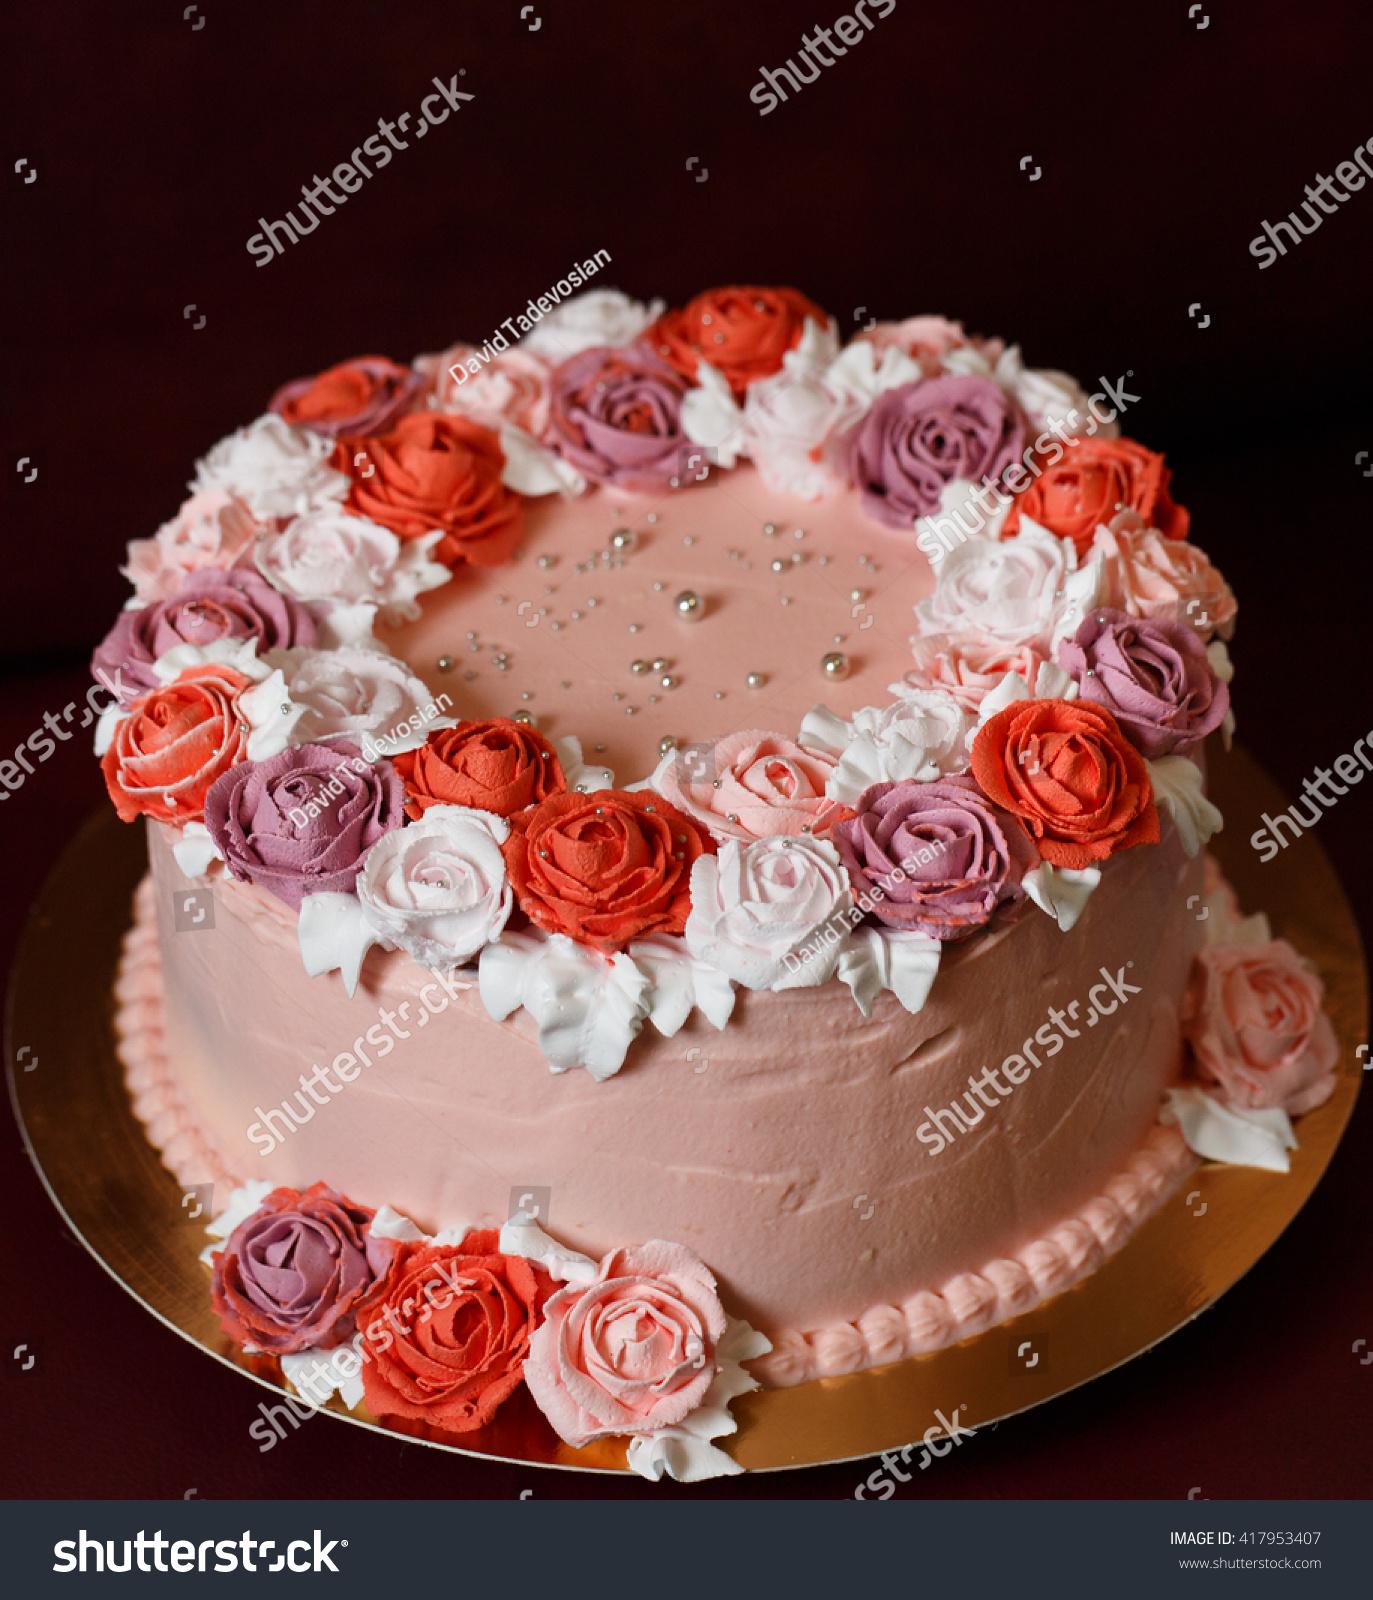 Birthday Cake Red Roses Stock Photo Edit Now 417953407 Shutterstock